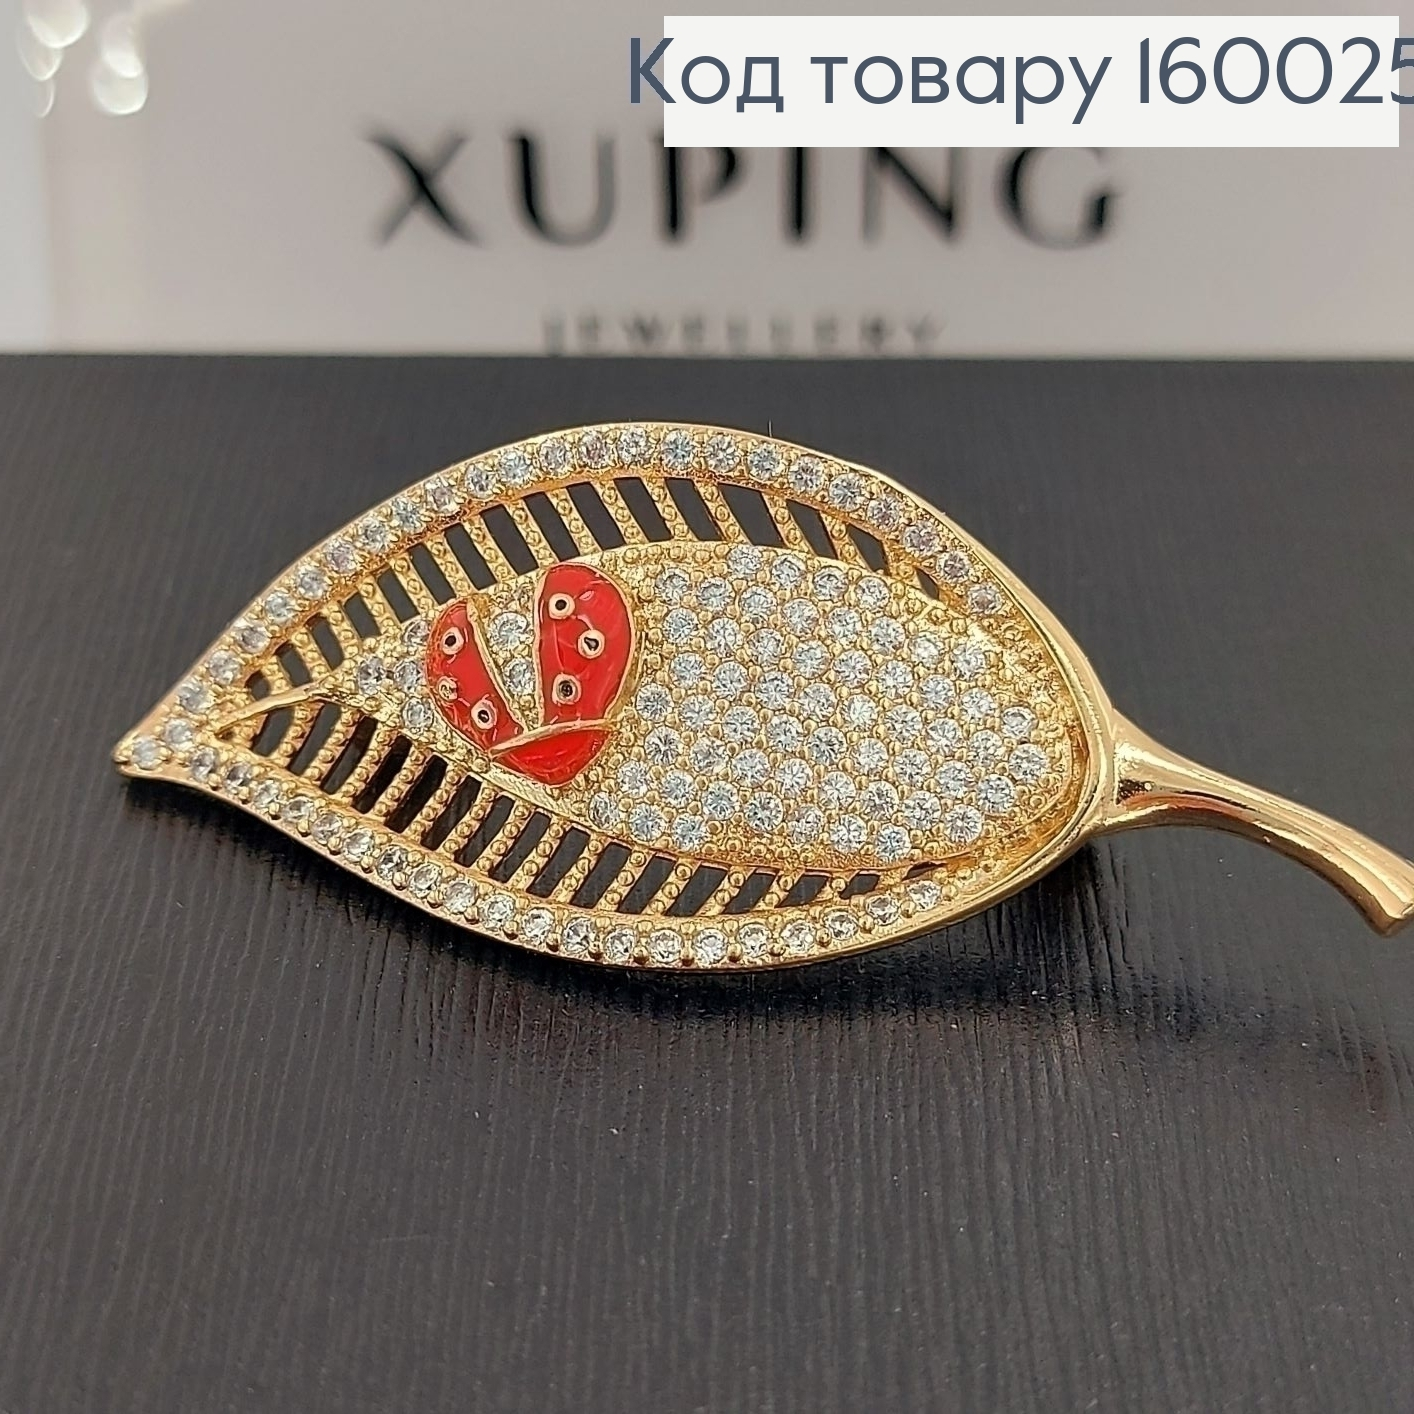 Брошка листочок з бедриком  в камінцях медичне золото  Xuping 18к 160025 фото 2